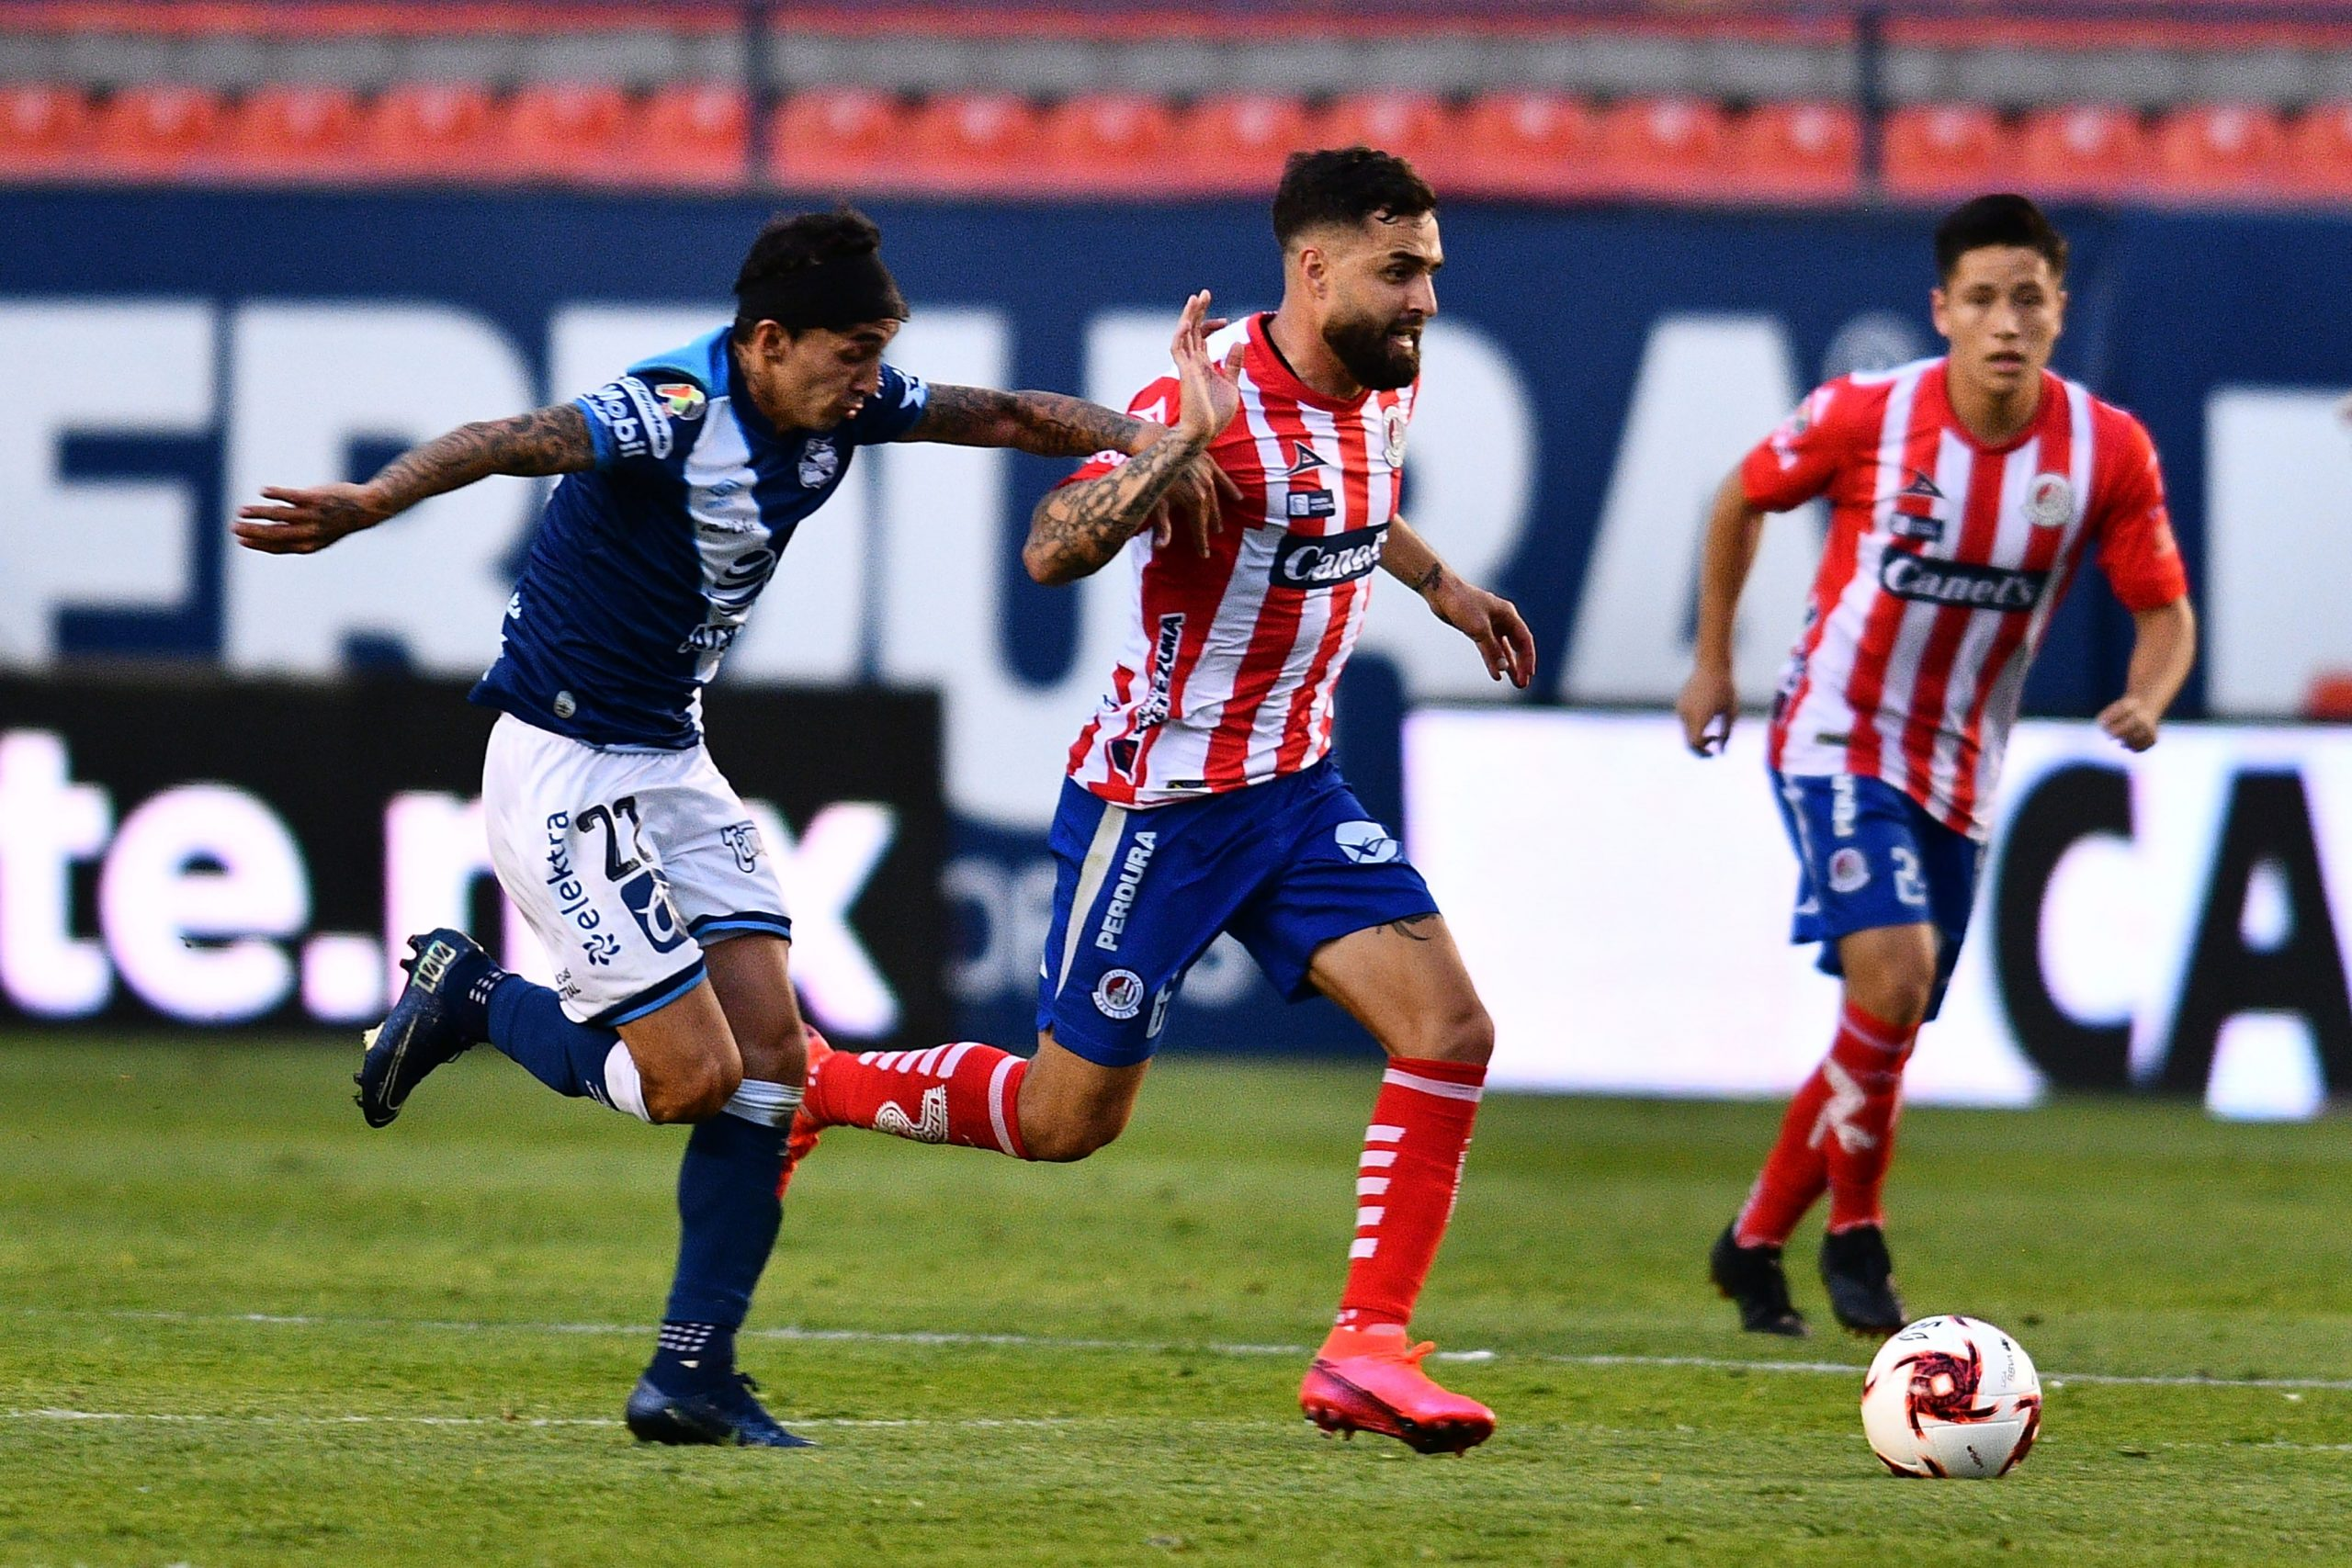 Mazatlan FC La maldicion de las ultimas franquicias